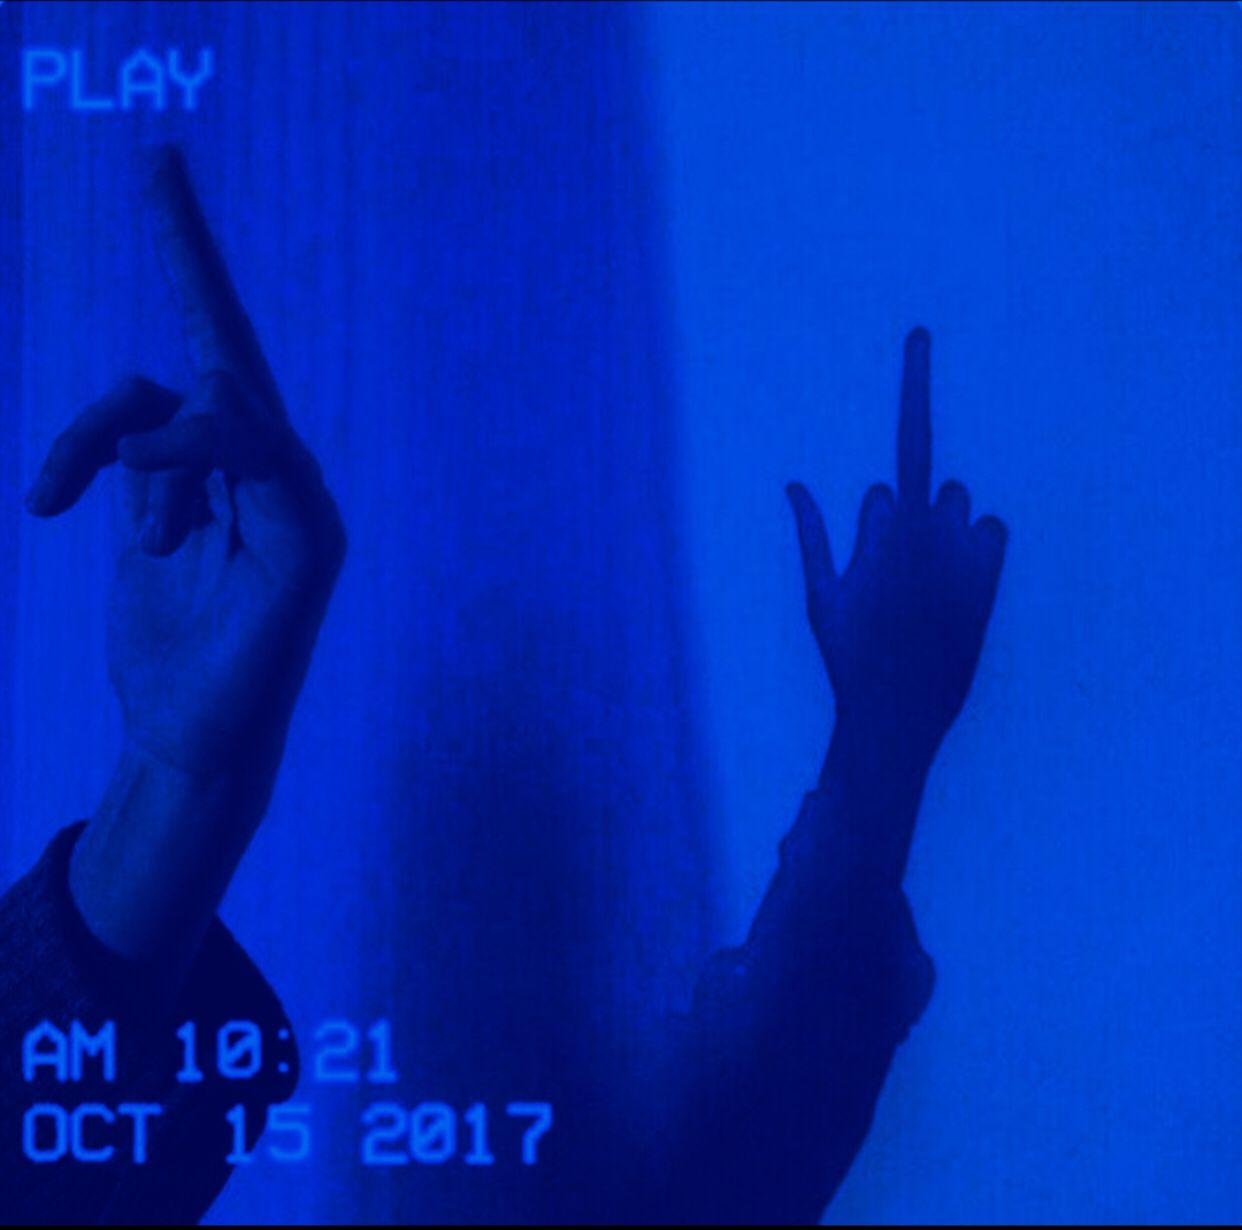 Dark Blue Aesthetic Blue Aesthetic Aesthetic Colors